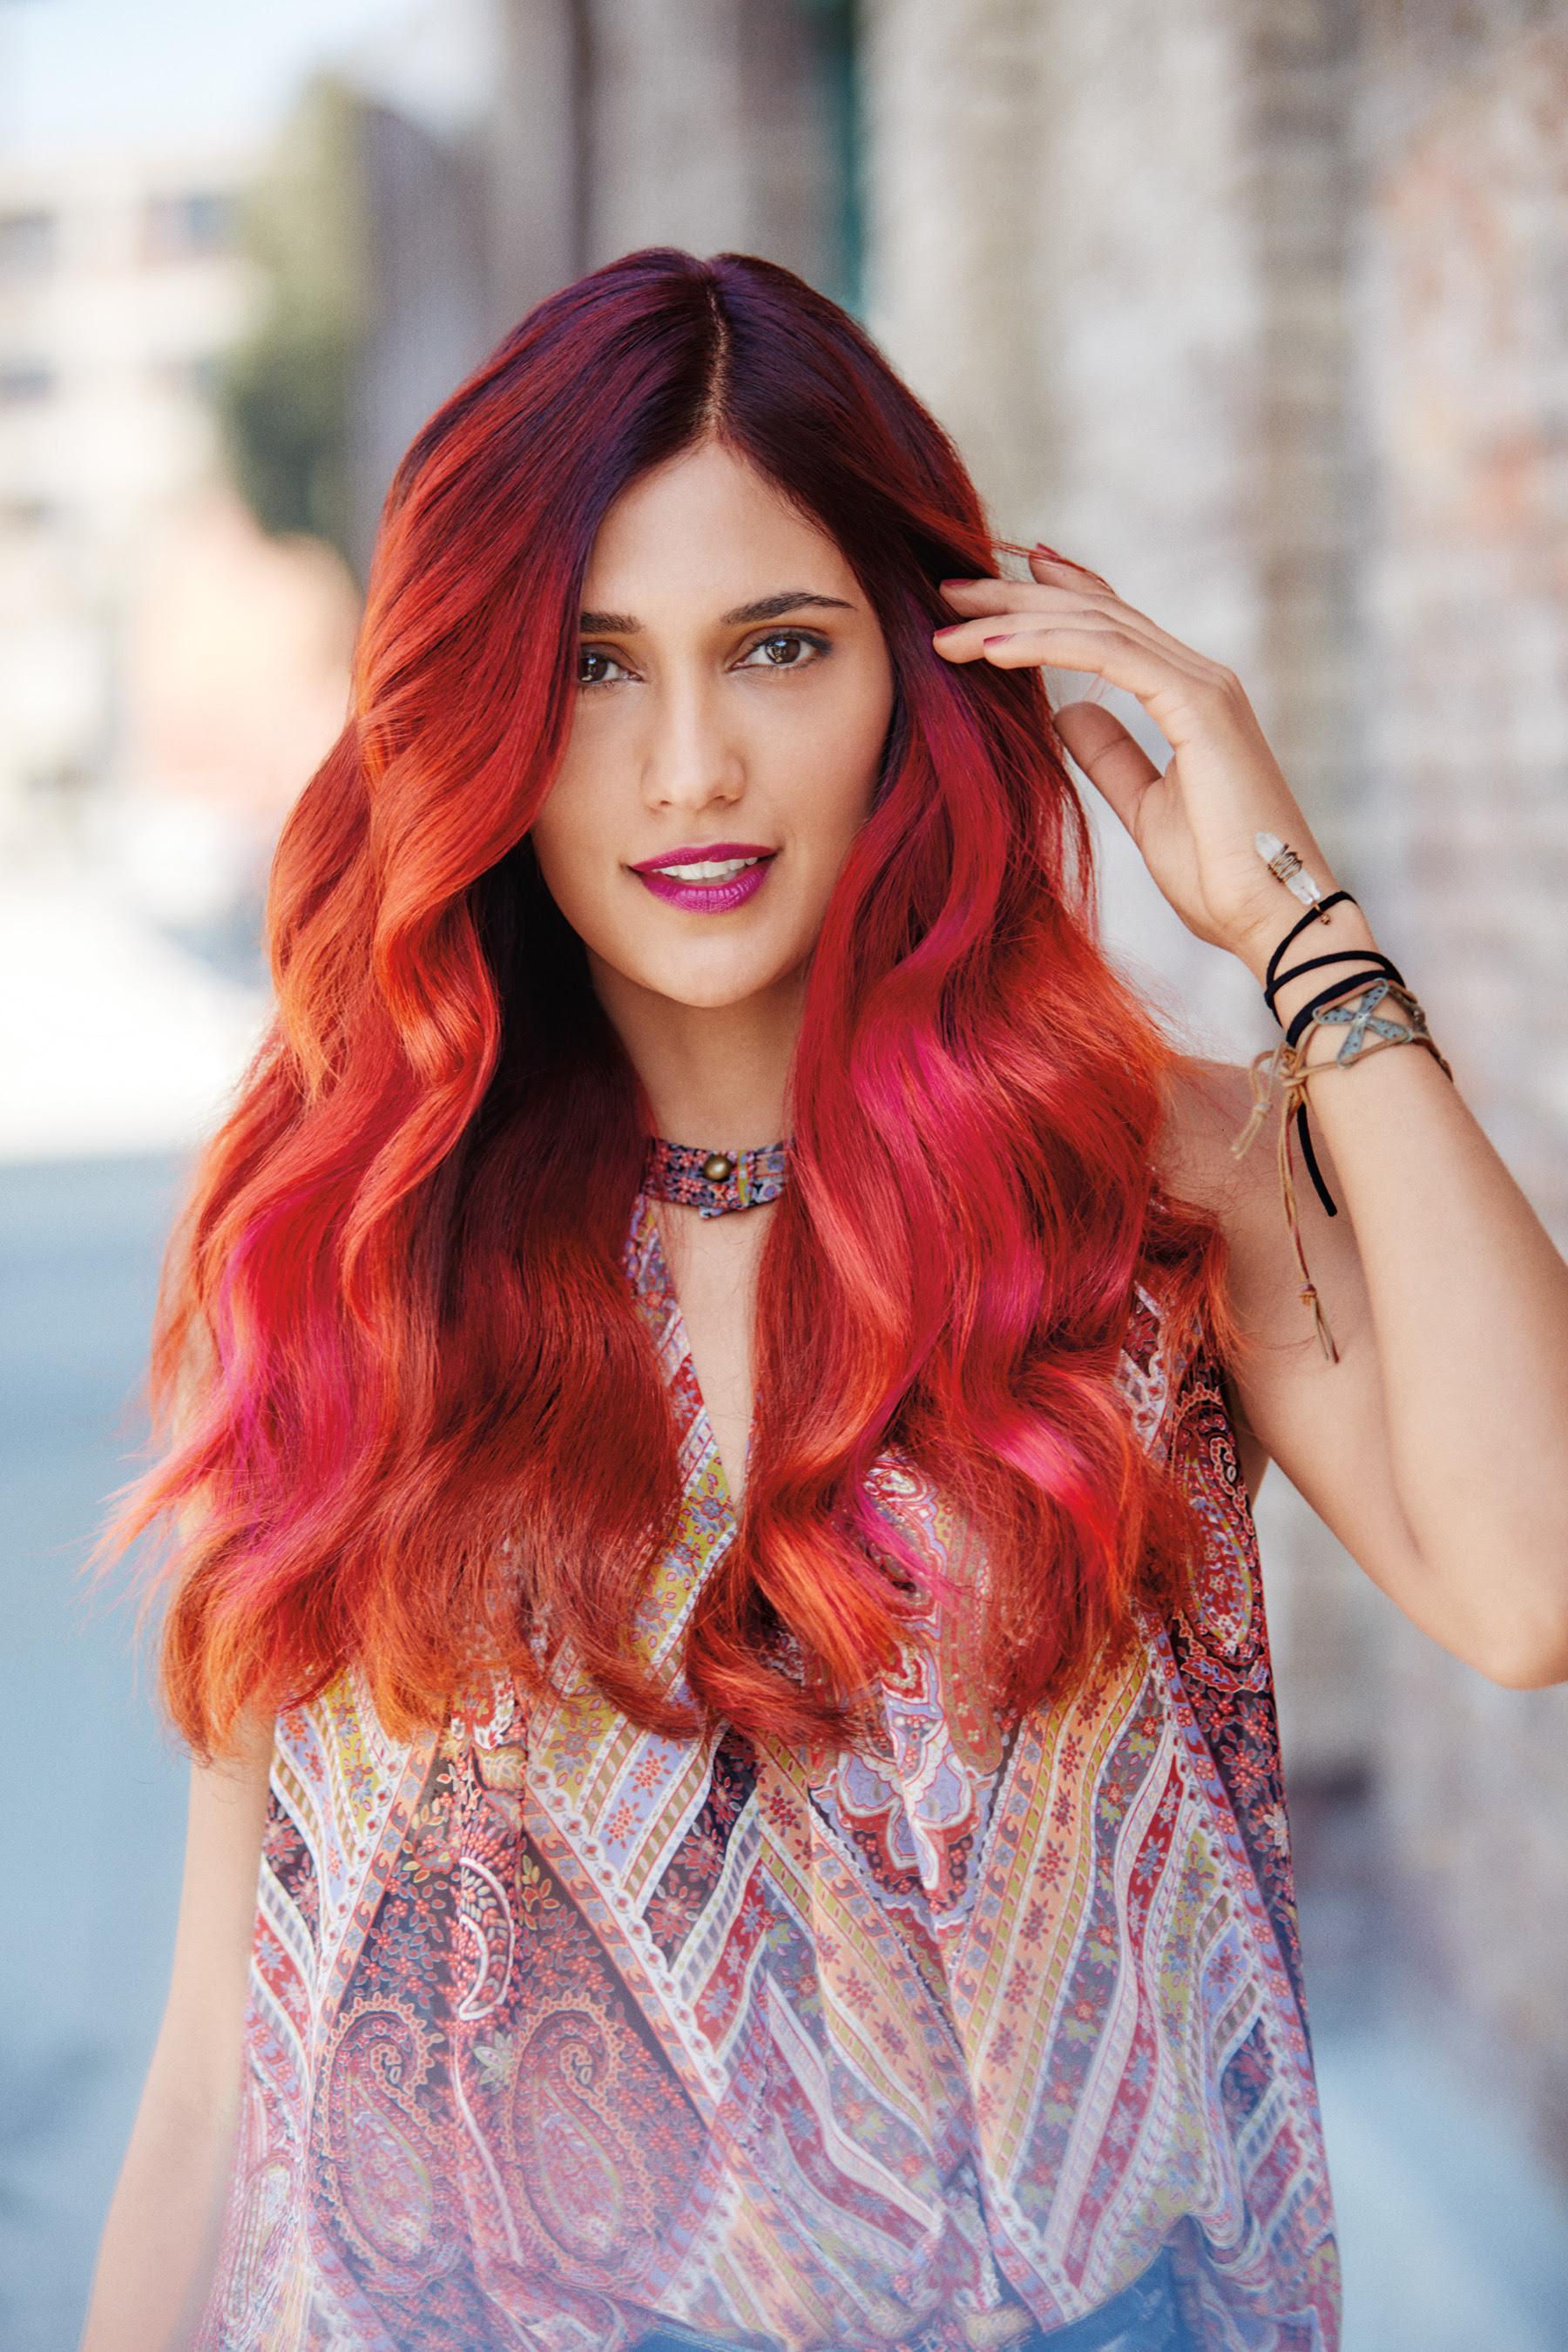 Clairol Professional Launches Permanent Vivid Hair Color ...